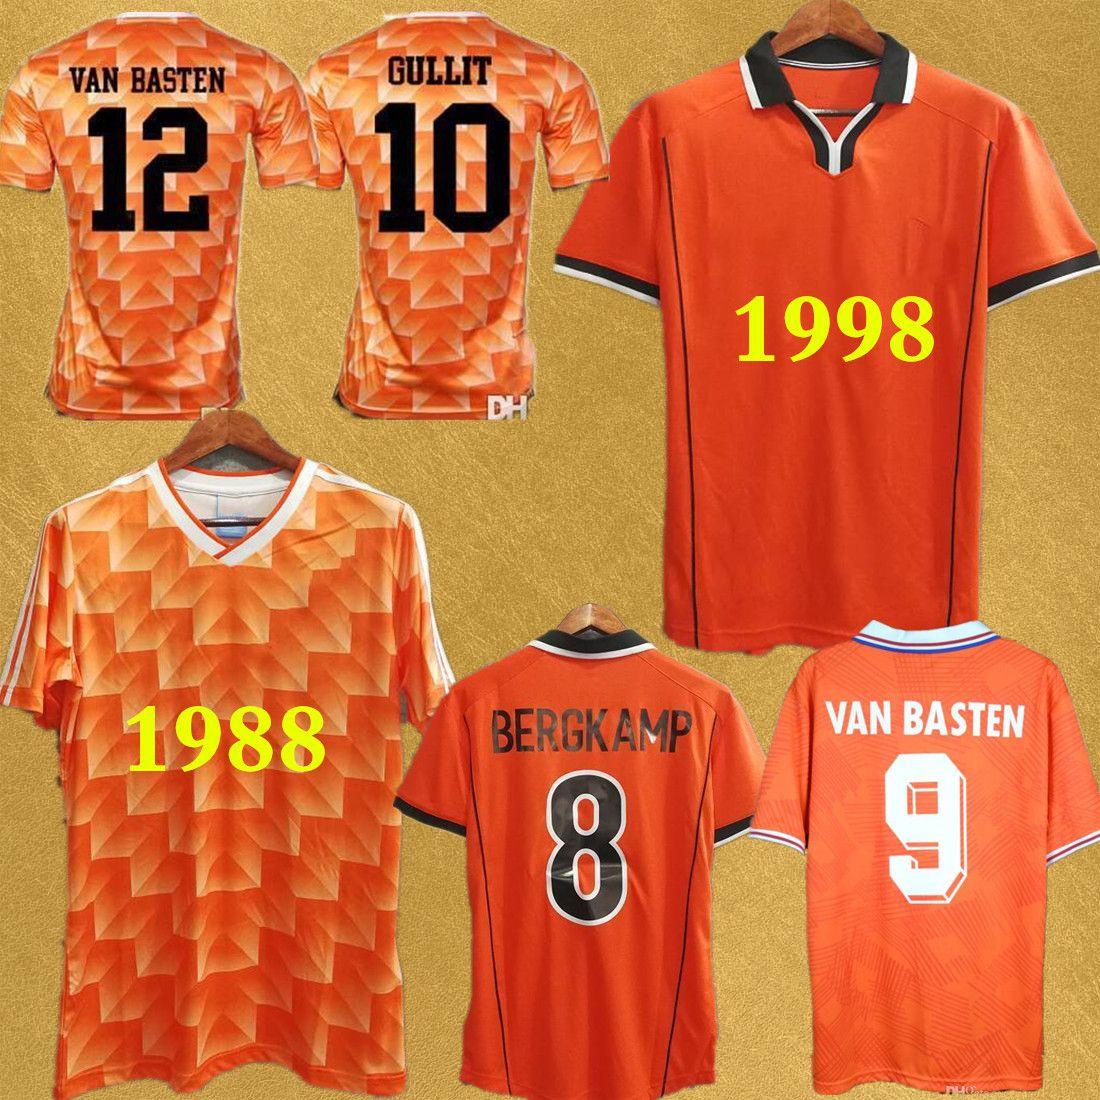 Retro calcio maglie Olanda 1998 Coppa del Mondo di Van Basten 1988 Olanda classica maglia da calcio Bergkamp Gullit Voetbal camisa de futebol